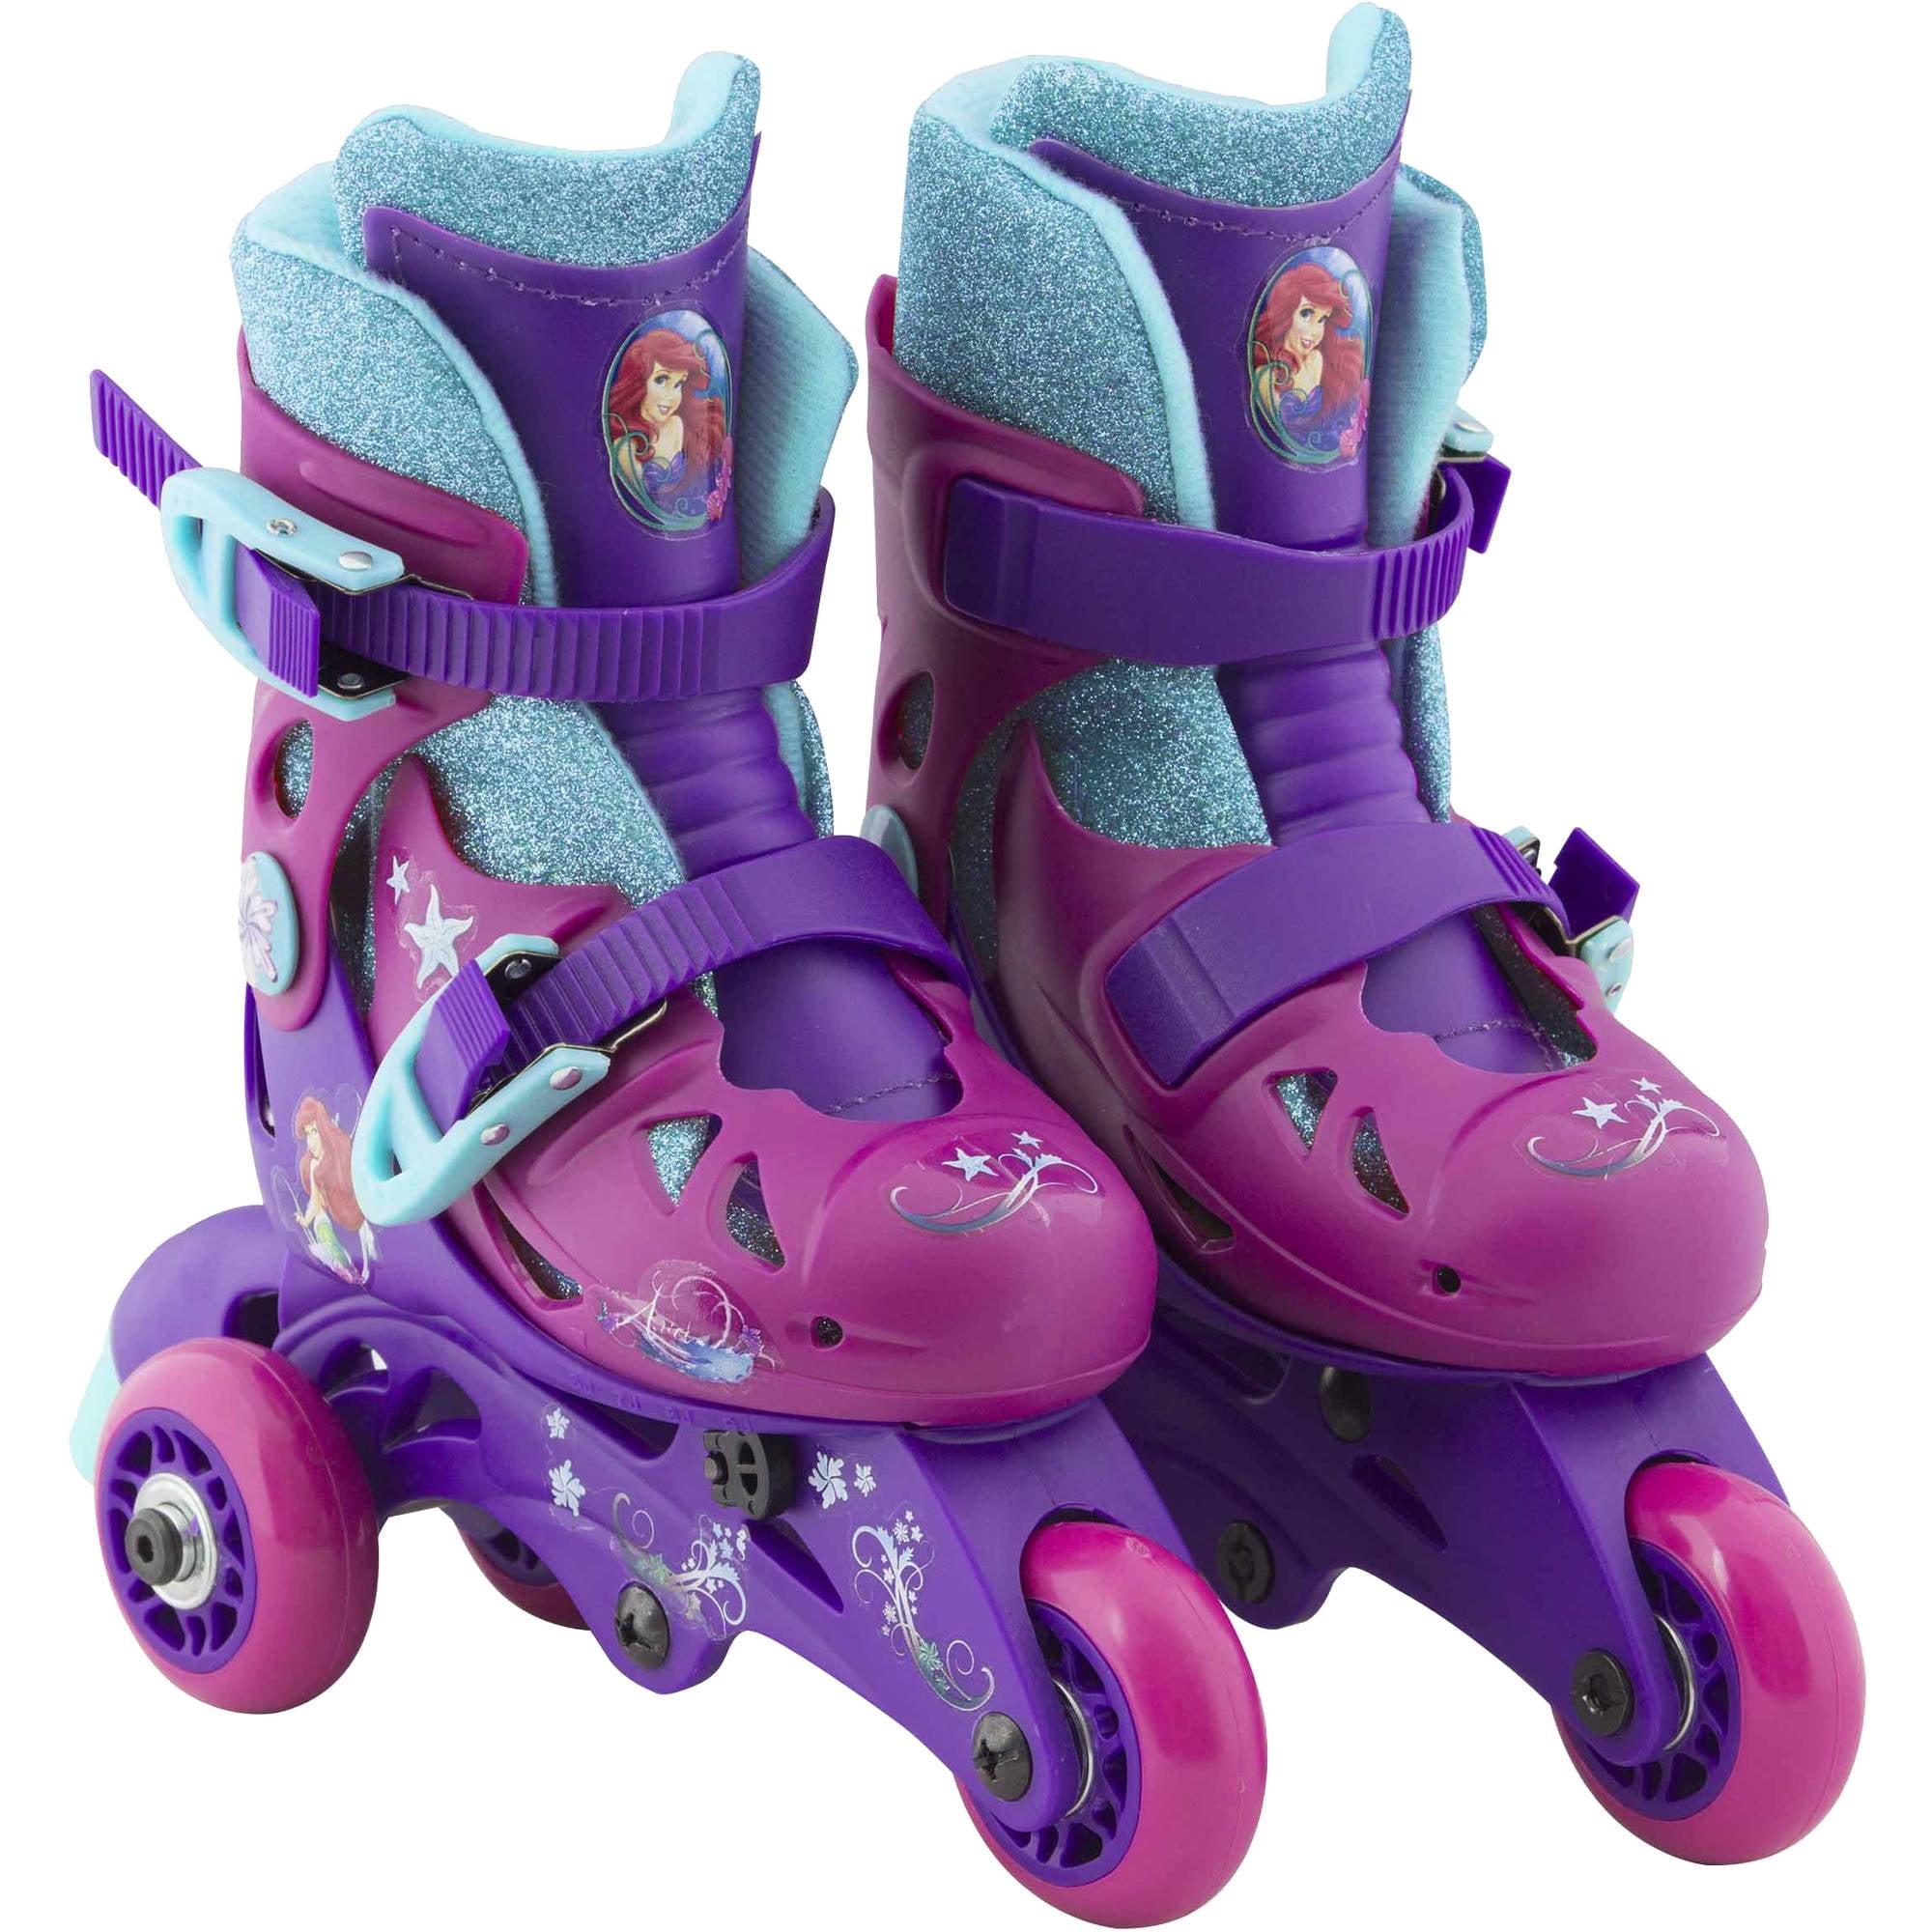 Roller skates for dogs - Playwheels Disney Little Mermaid Convertible 2 In 1 Kids Skate Junior Size 6 9 Walmart Com